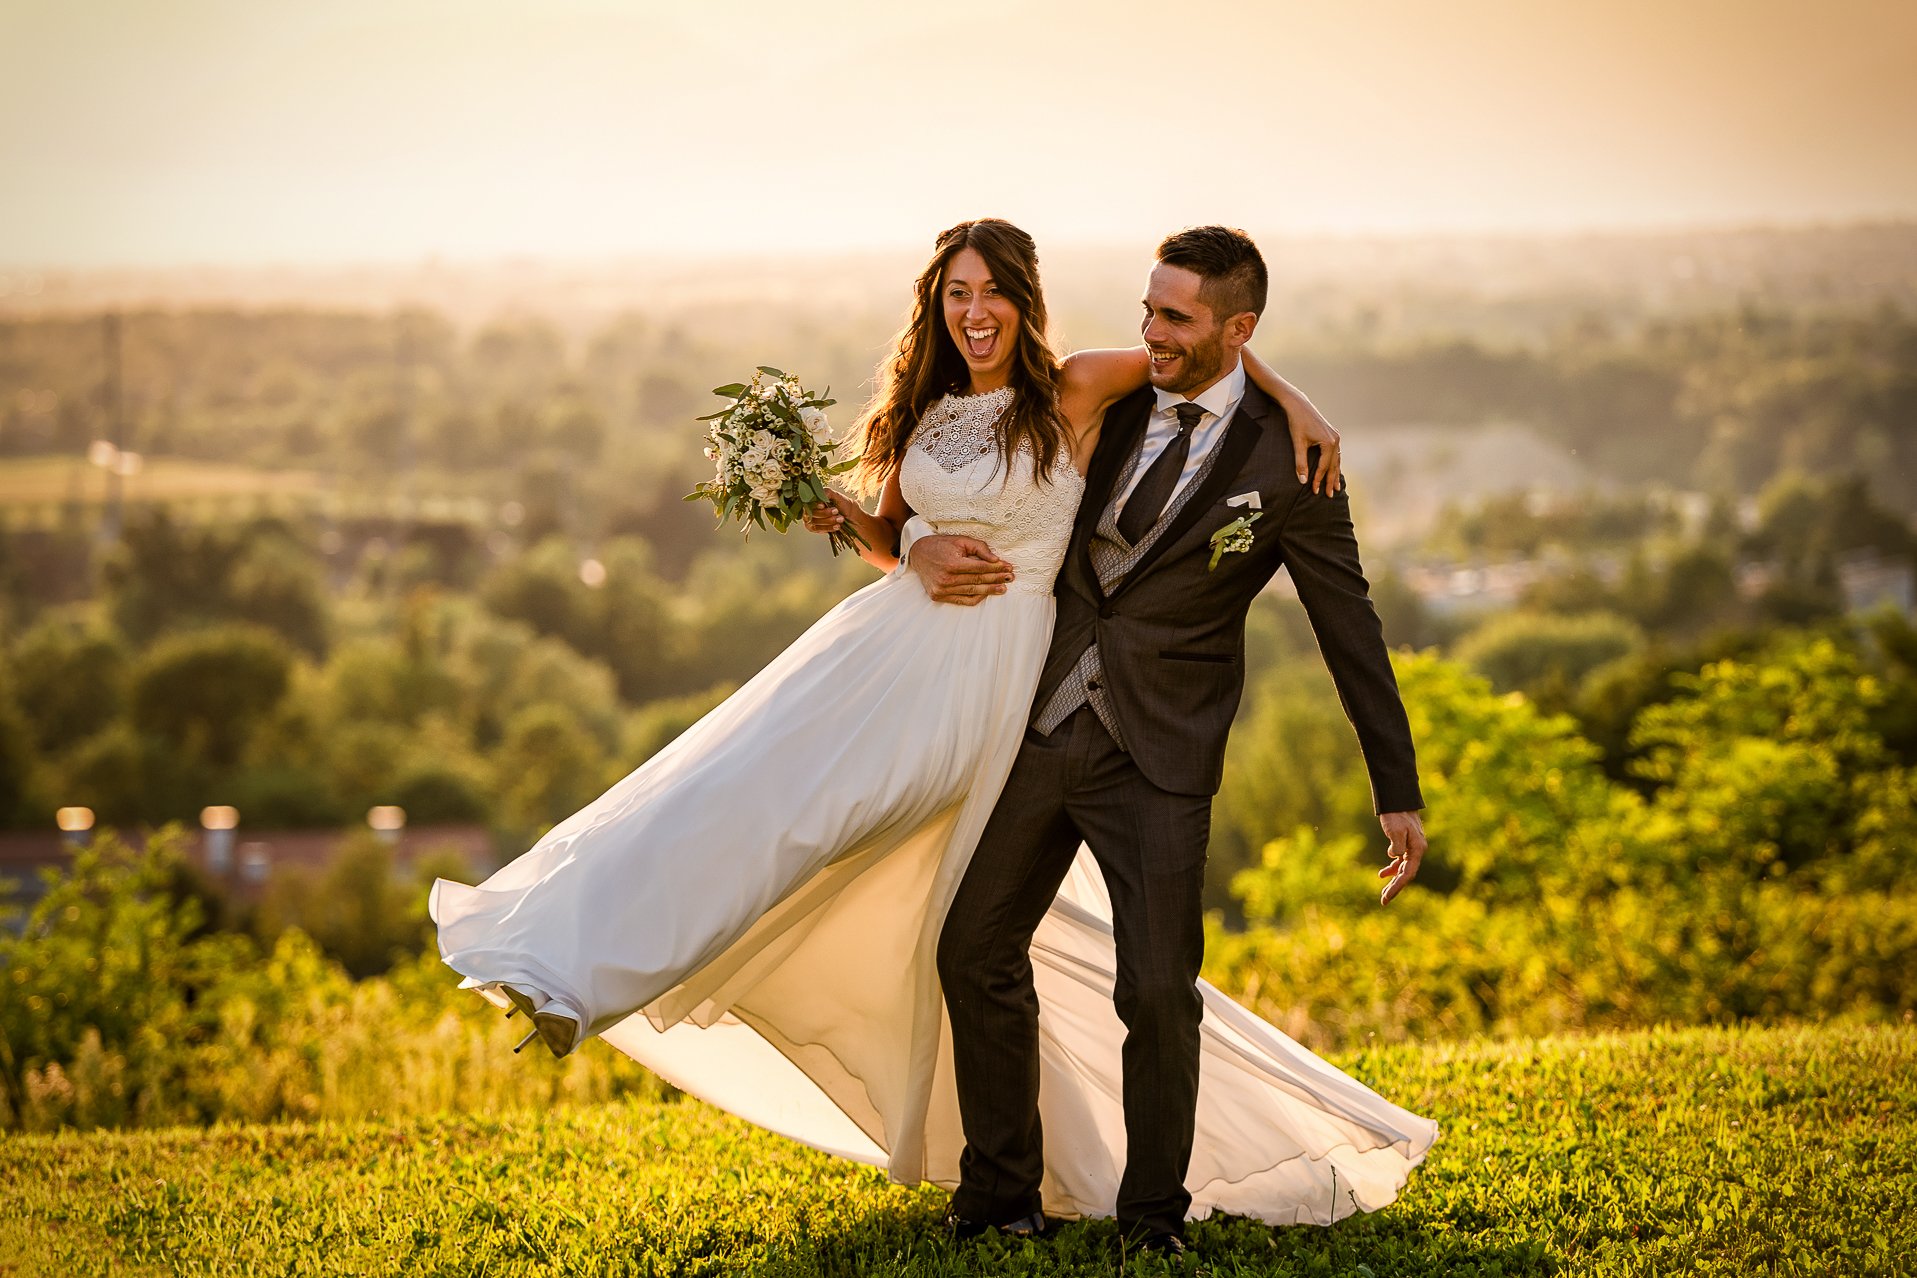 fotografo matrimonio - sposo solleva la sposa